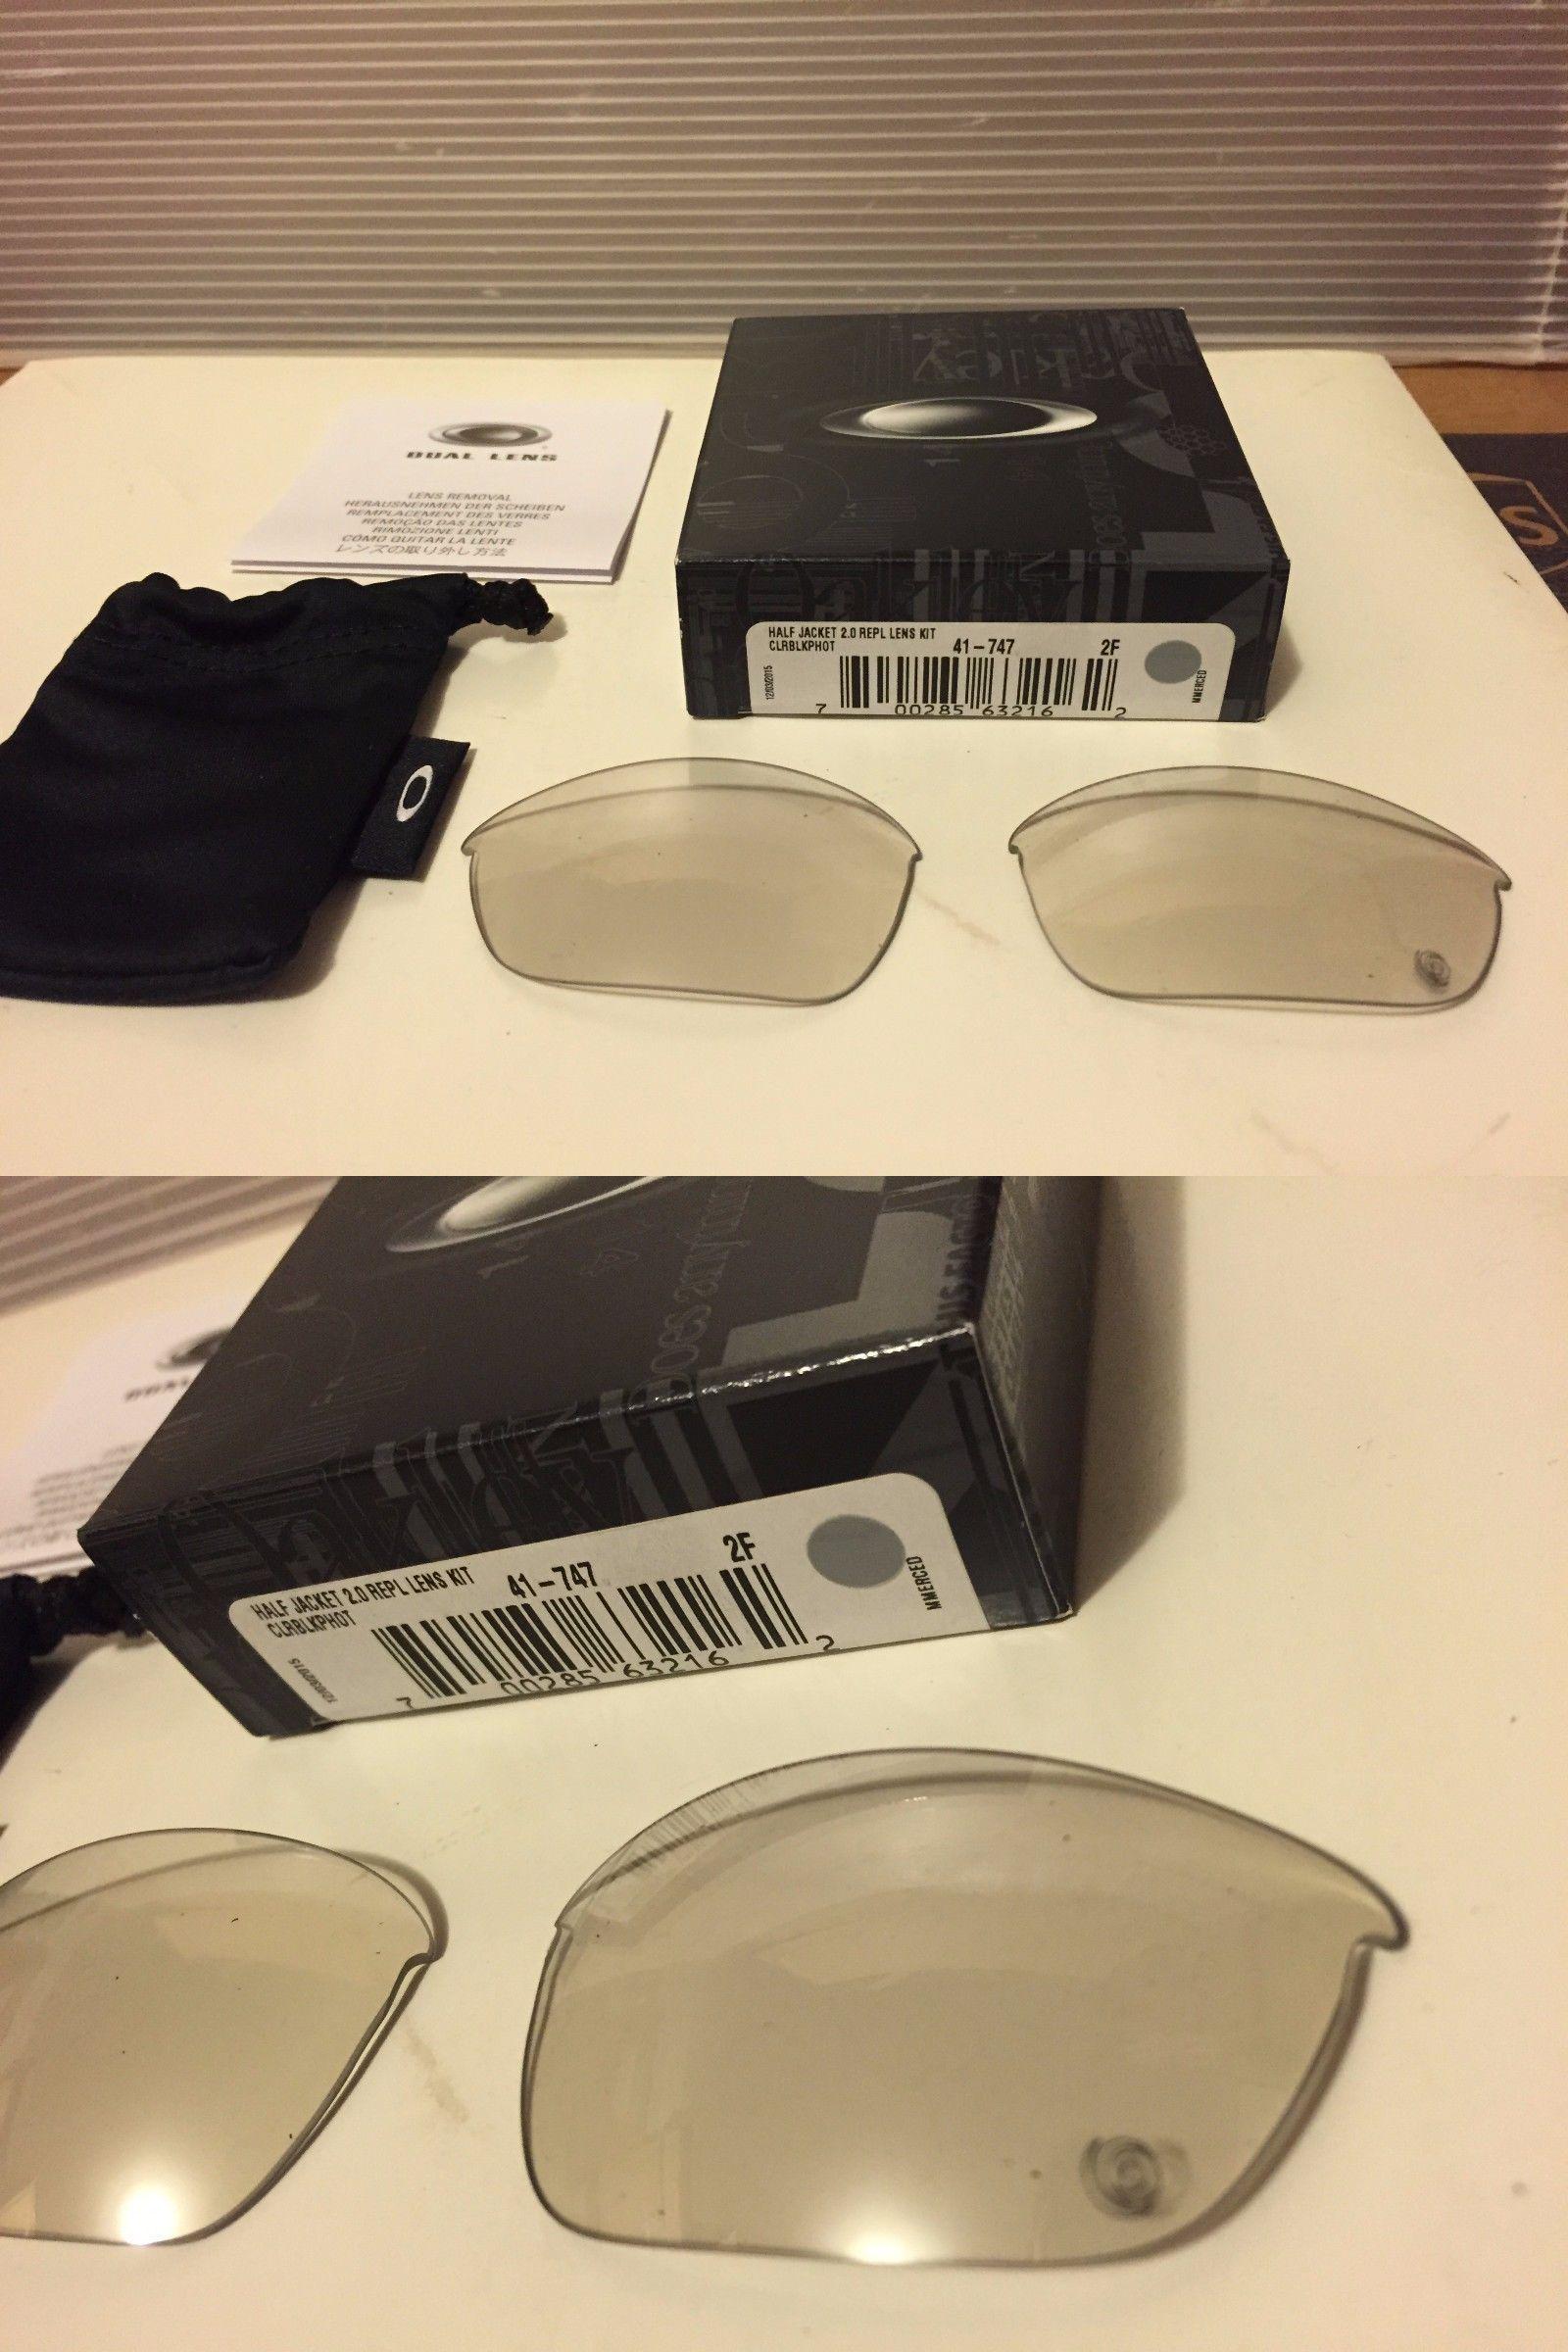 ec3fcdb8c74 Sunglass Lens Replacements 179194  New Oakley Half Jacket 2.0 Replacement  Lens Clear-Black Photochromic